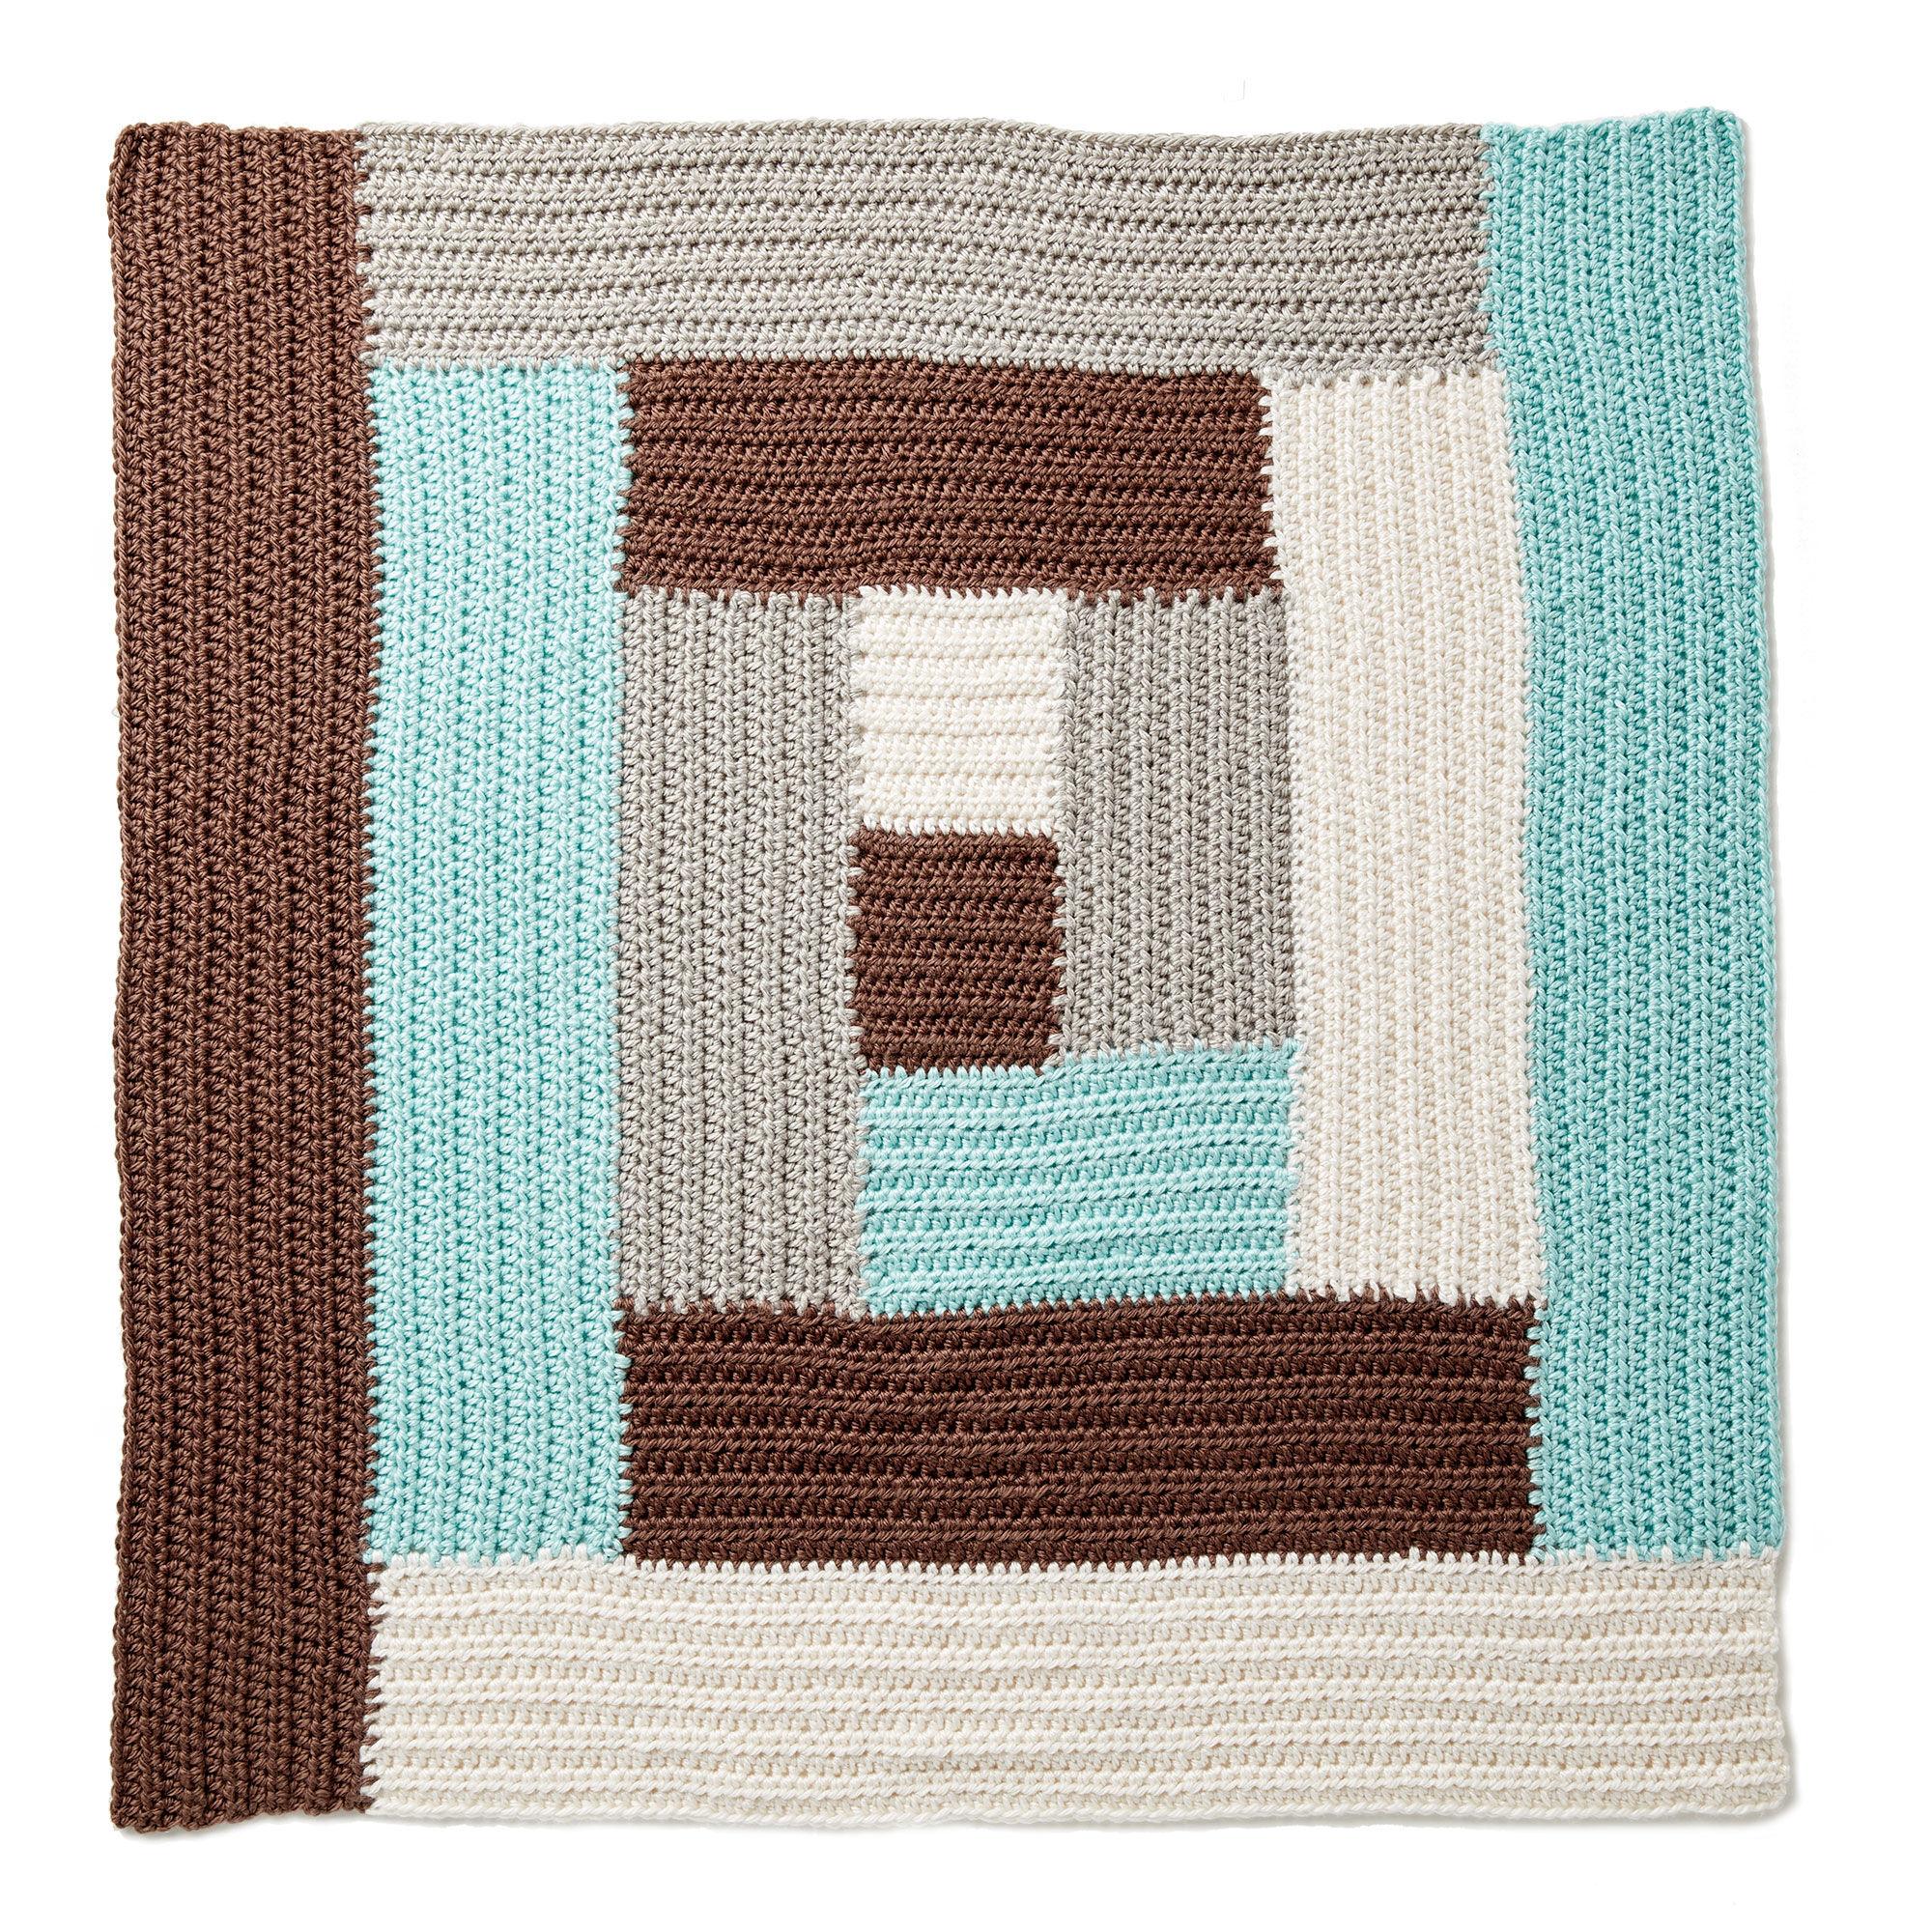 Bernat Log Cabin Crochet Baby Blanket | Yarnspirations